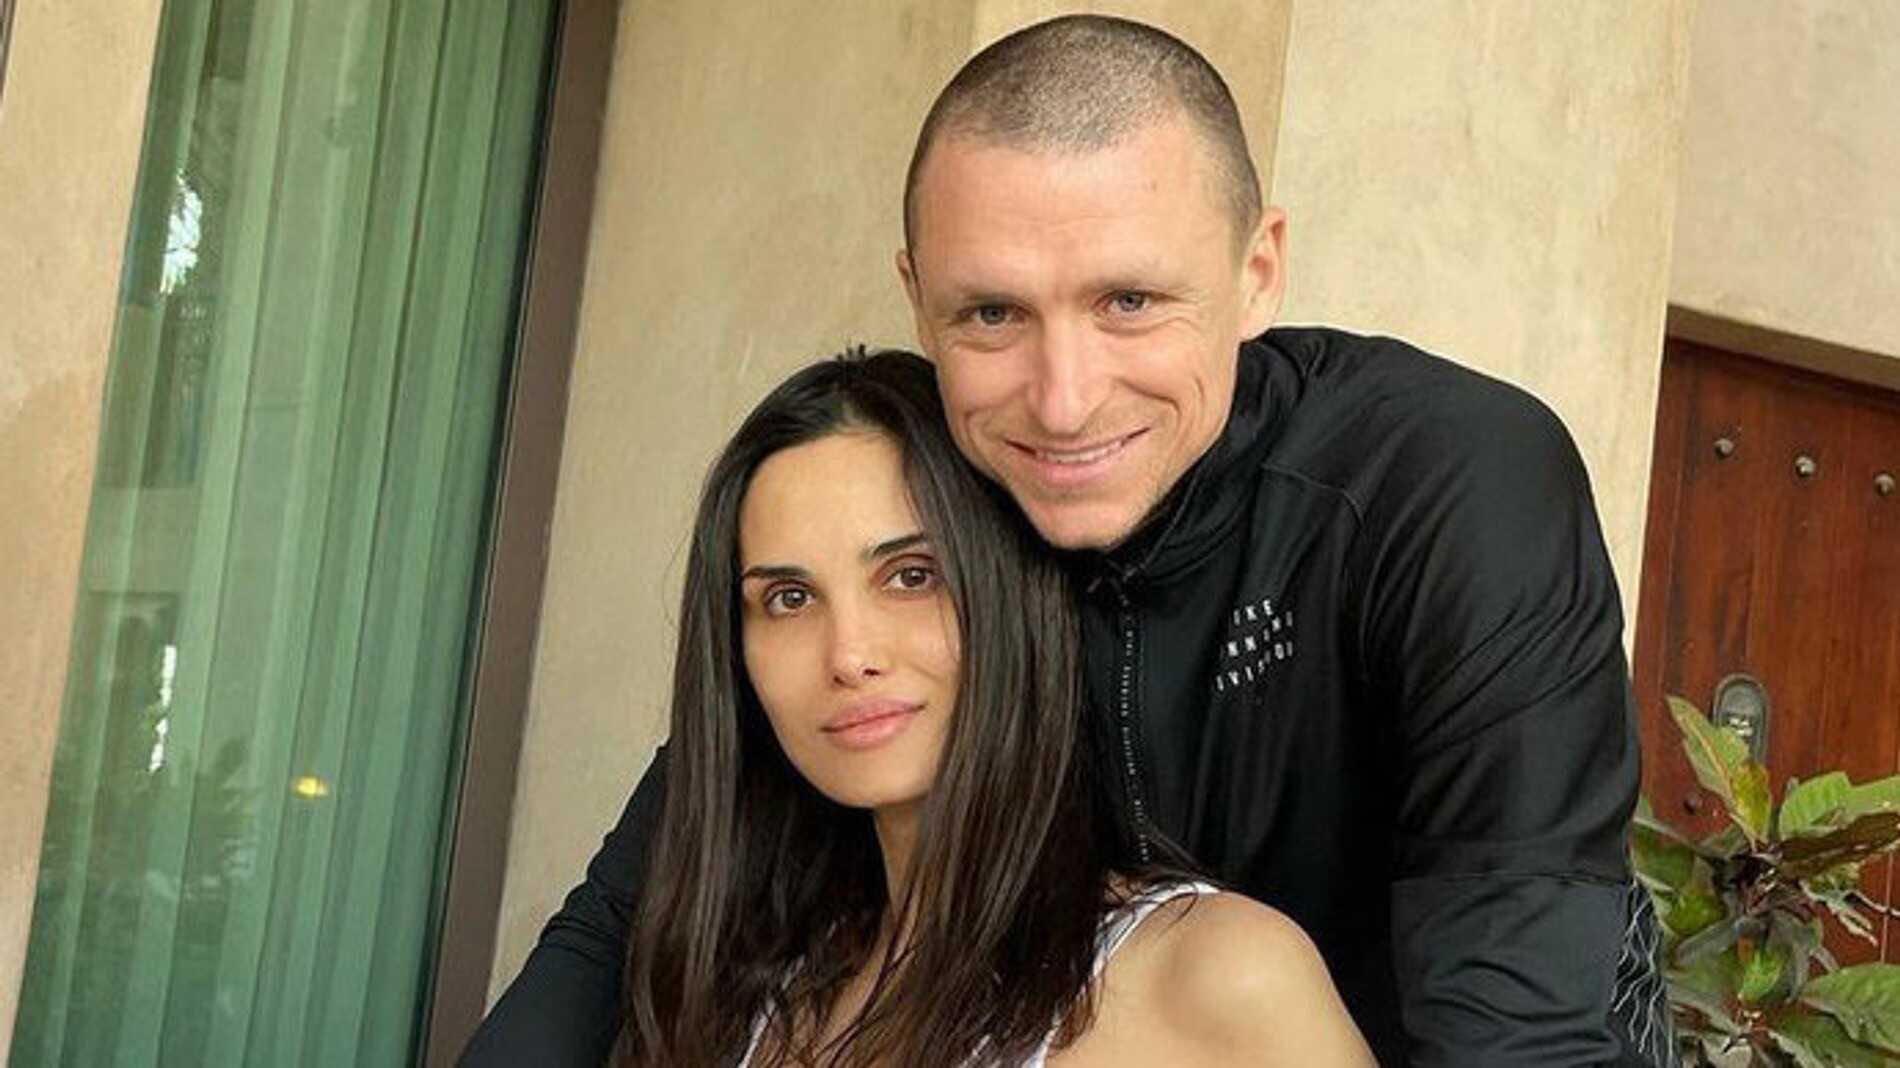 Alana Mamaeva said that Pavel Mamaev regularly beat her son